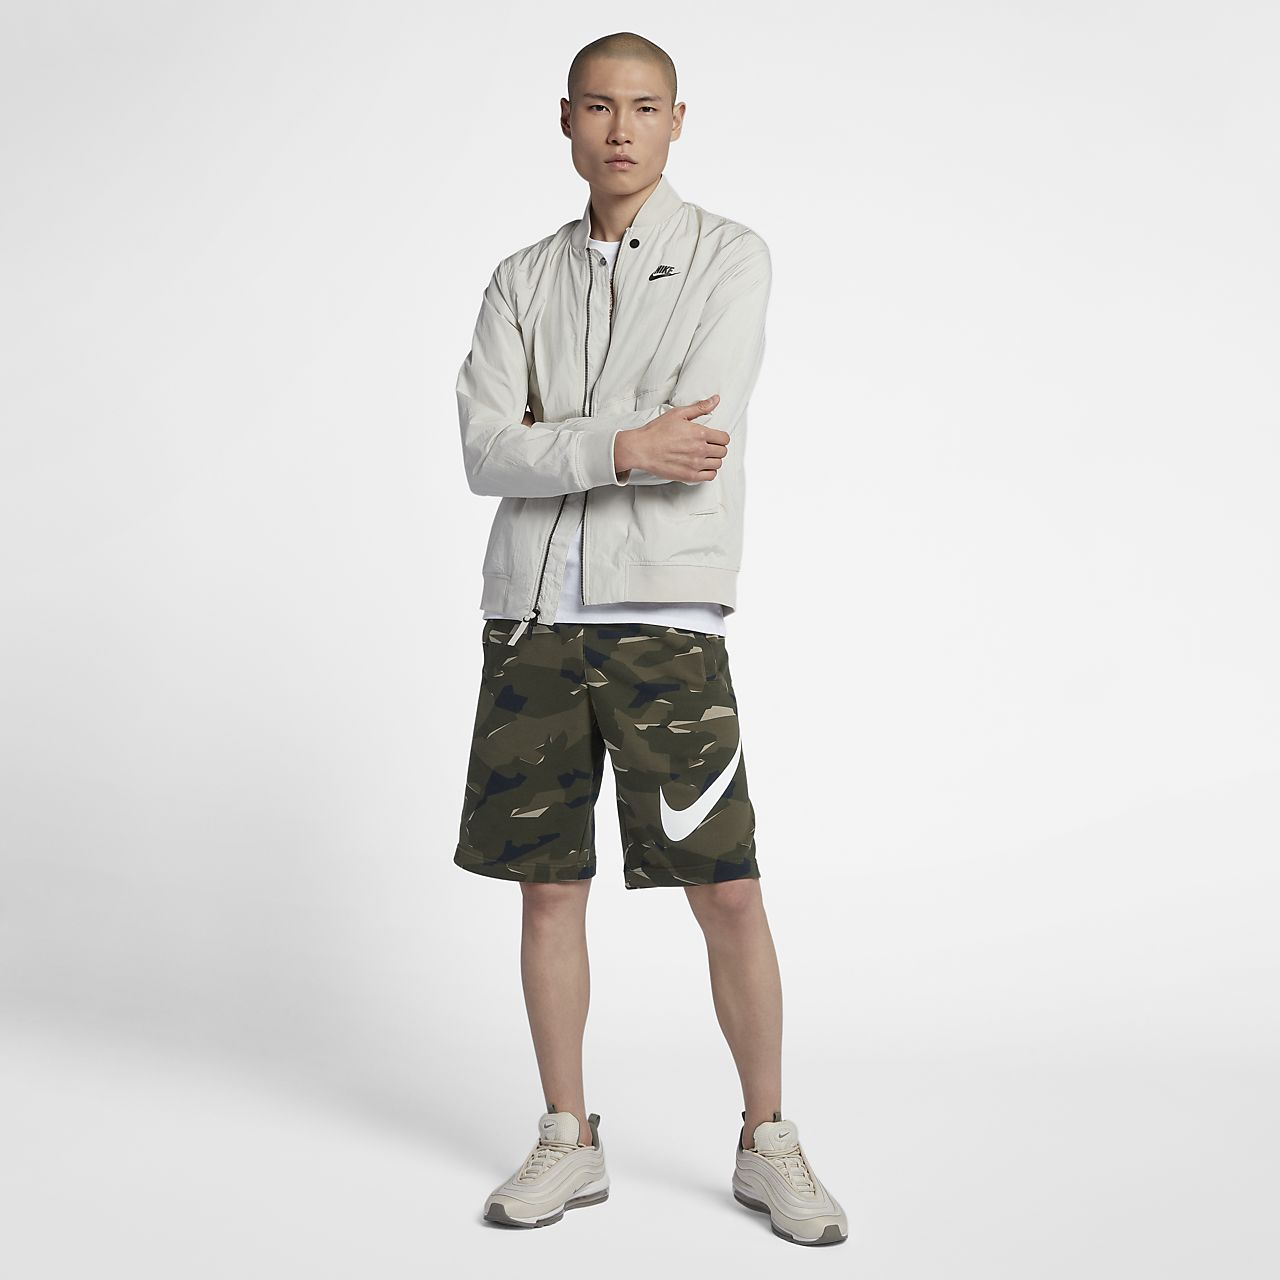 8a0a3a4ab96 Low Resolution Nike Sportswear Men s Camo Shorts Nike Sportswear Men s Camo  Shorts